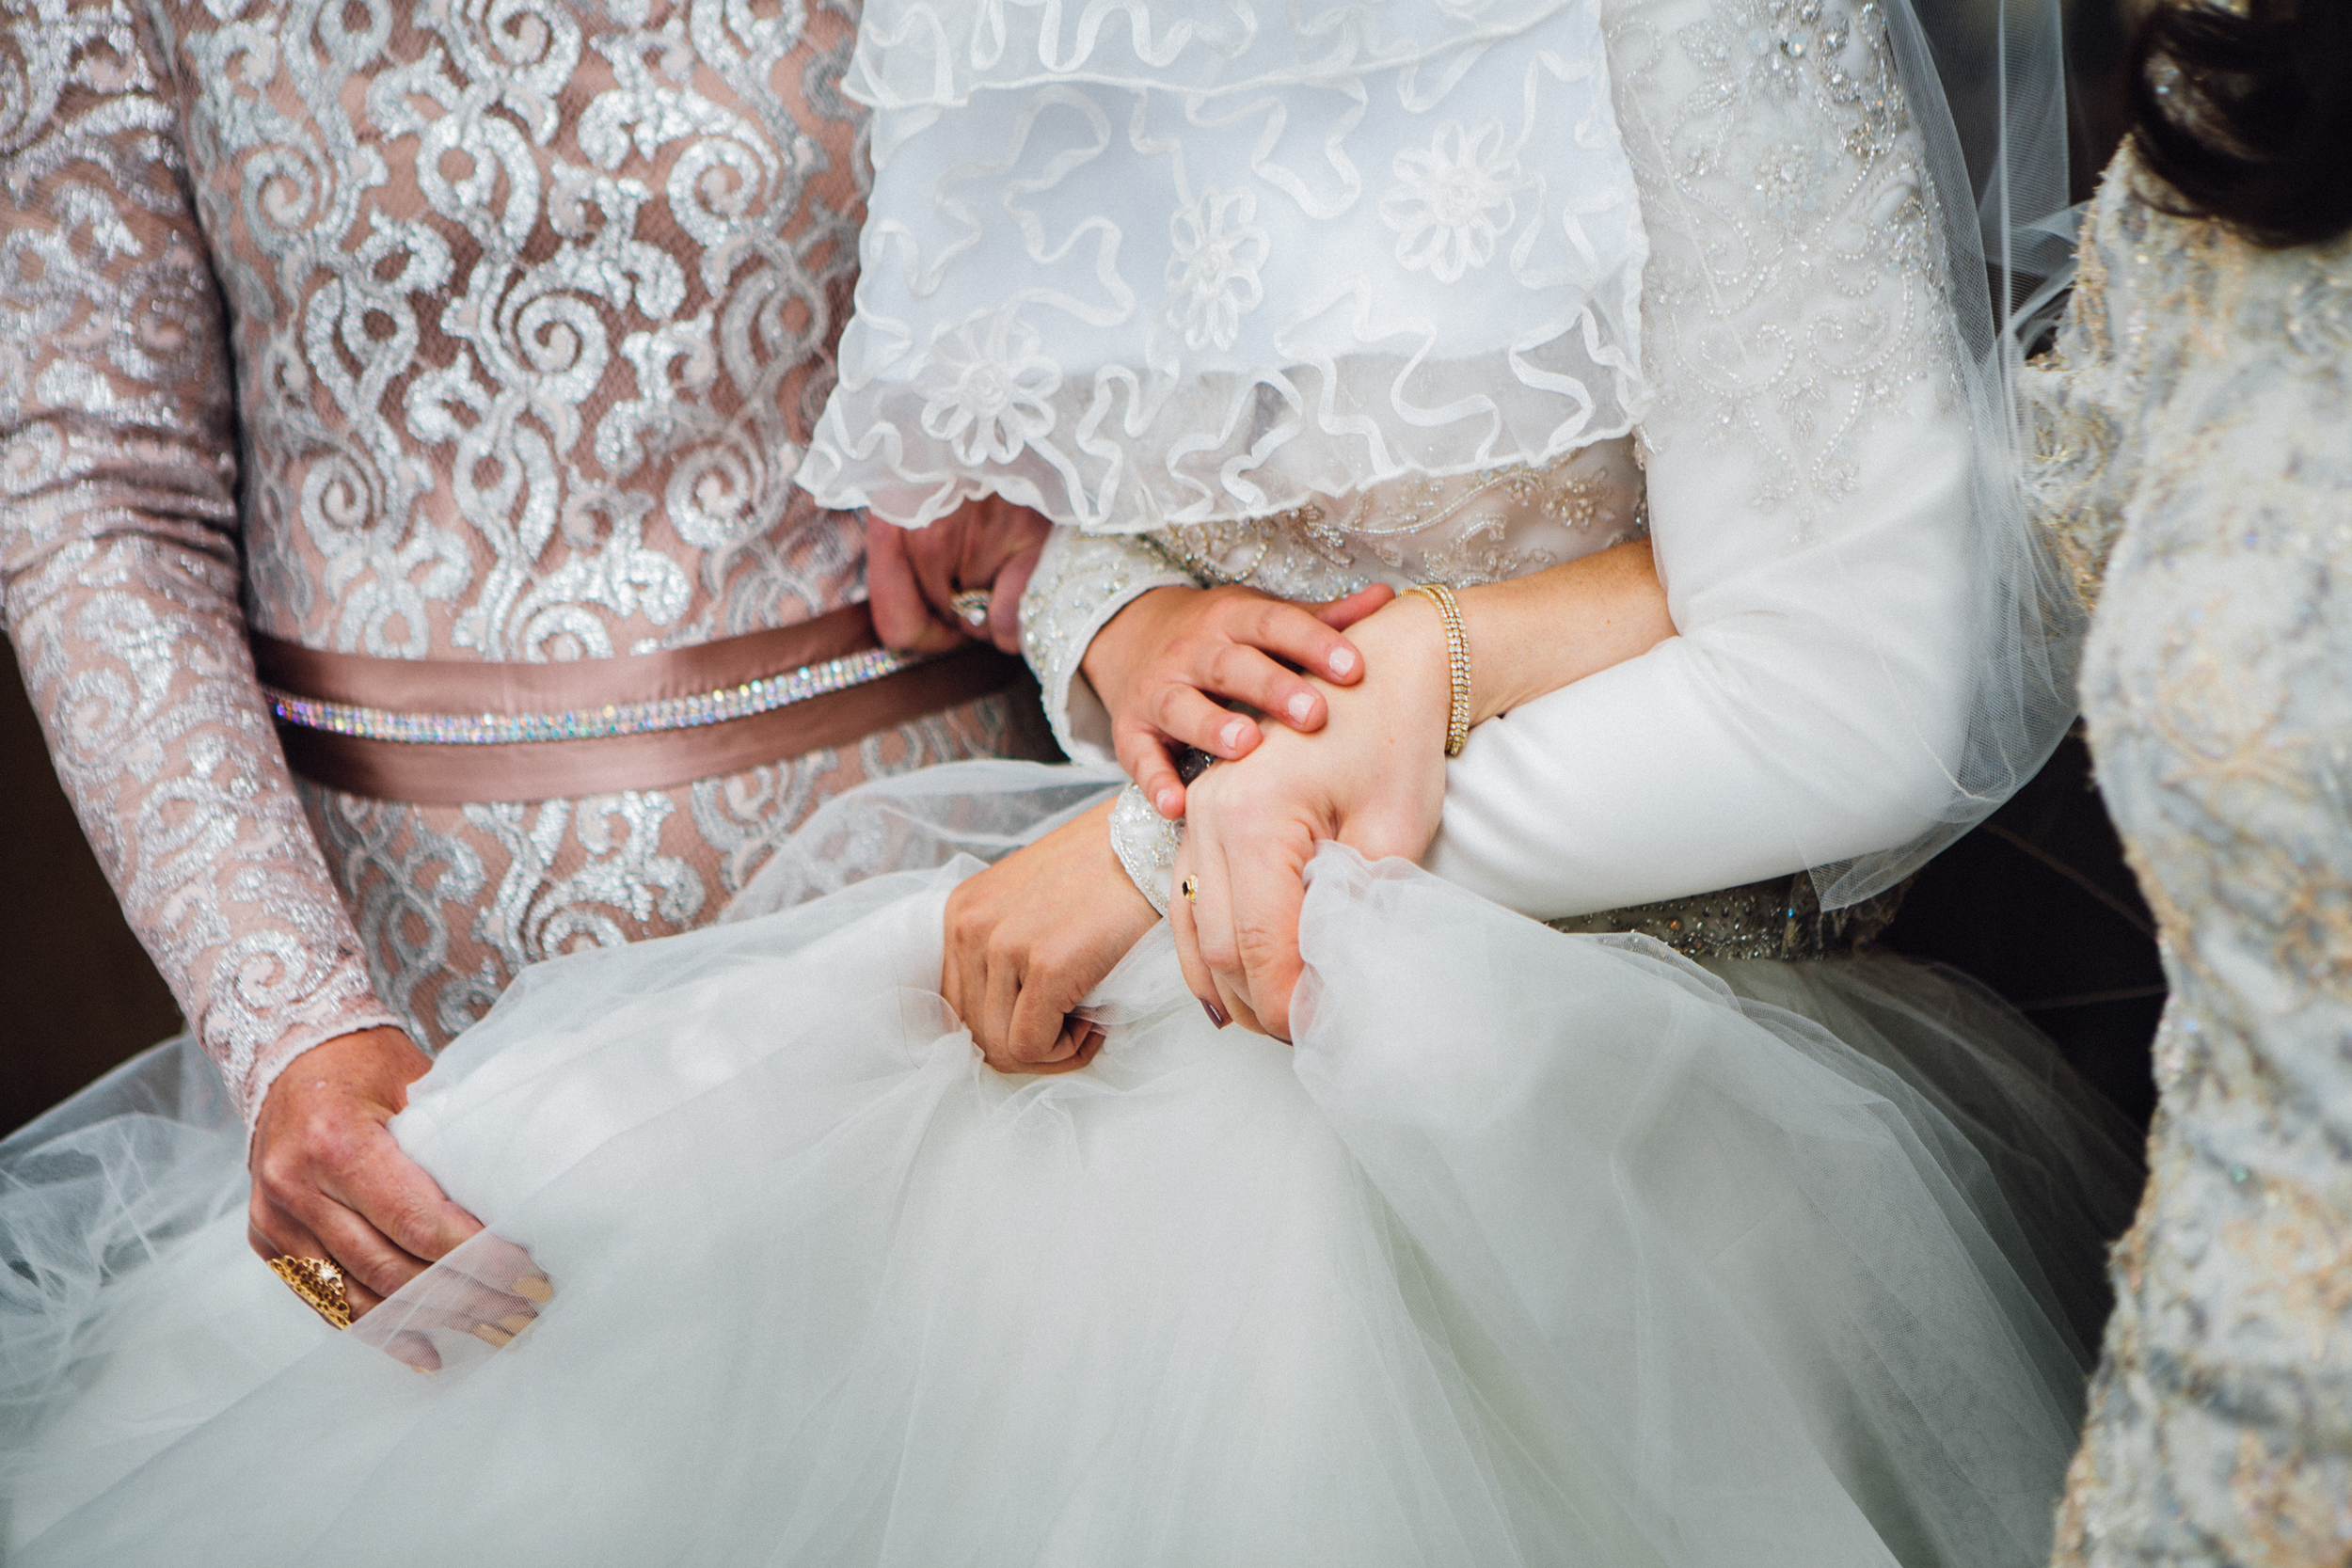 Wedding Iossi and Gitty Khafif  - Eliau Piha studio photography, new york, events, people 770 brooklyn -0351.jpg